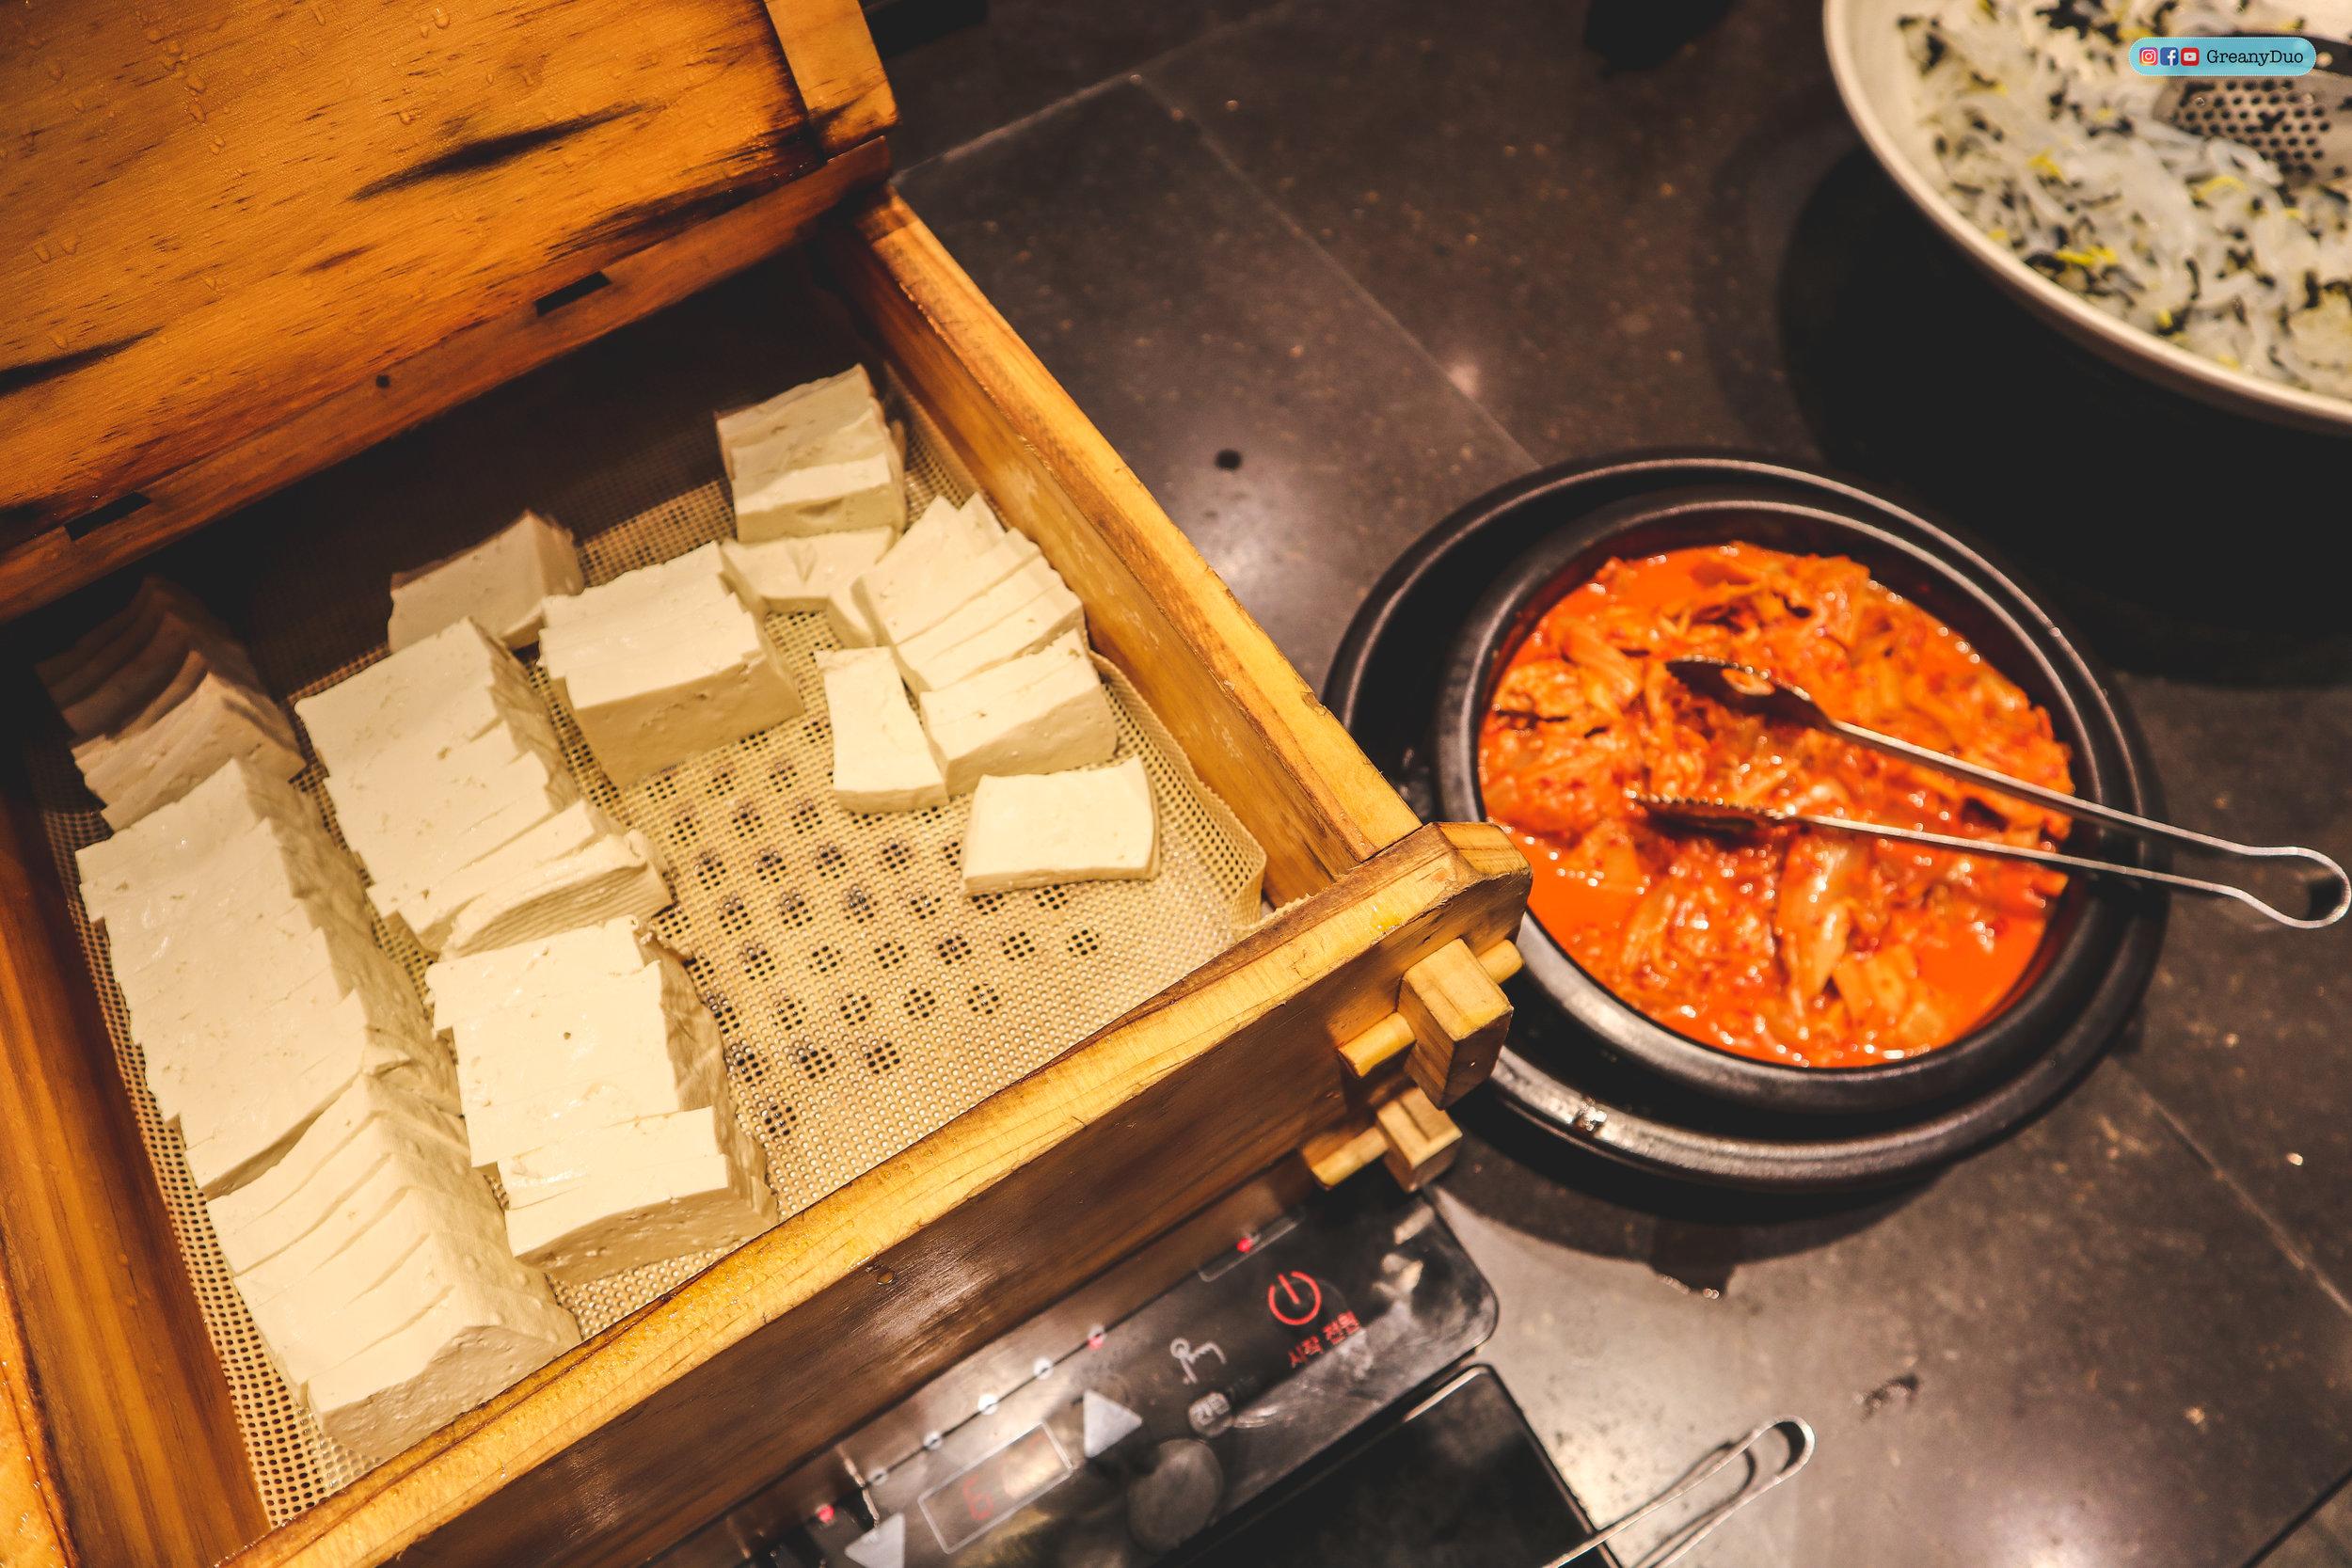 korean sidedishes at nature kitchen buffet, seoul korea